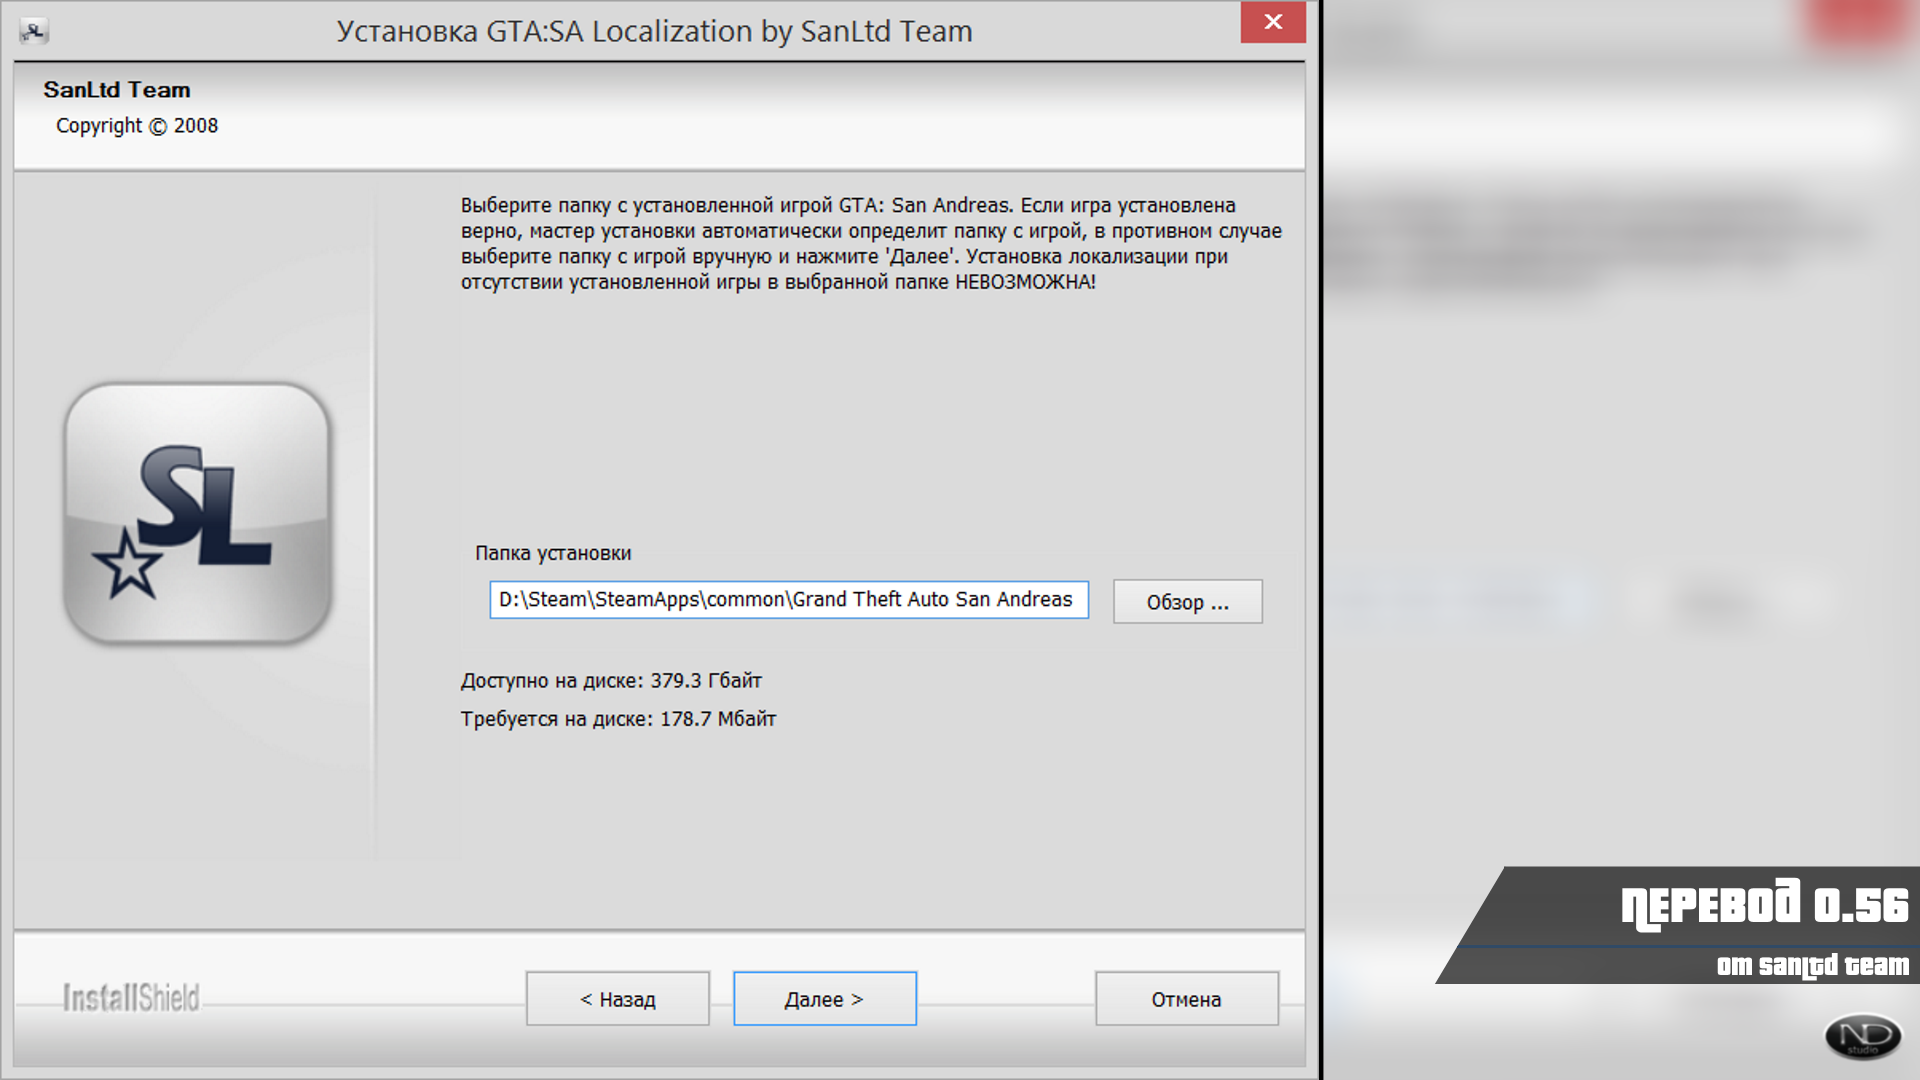 Gta san andreas разрешение экрана 1366x768